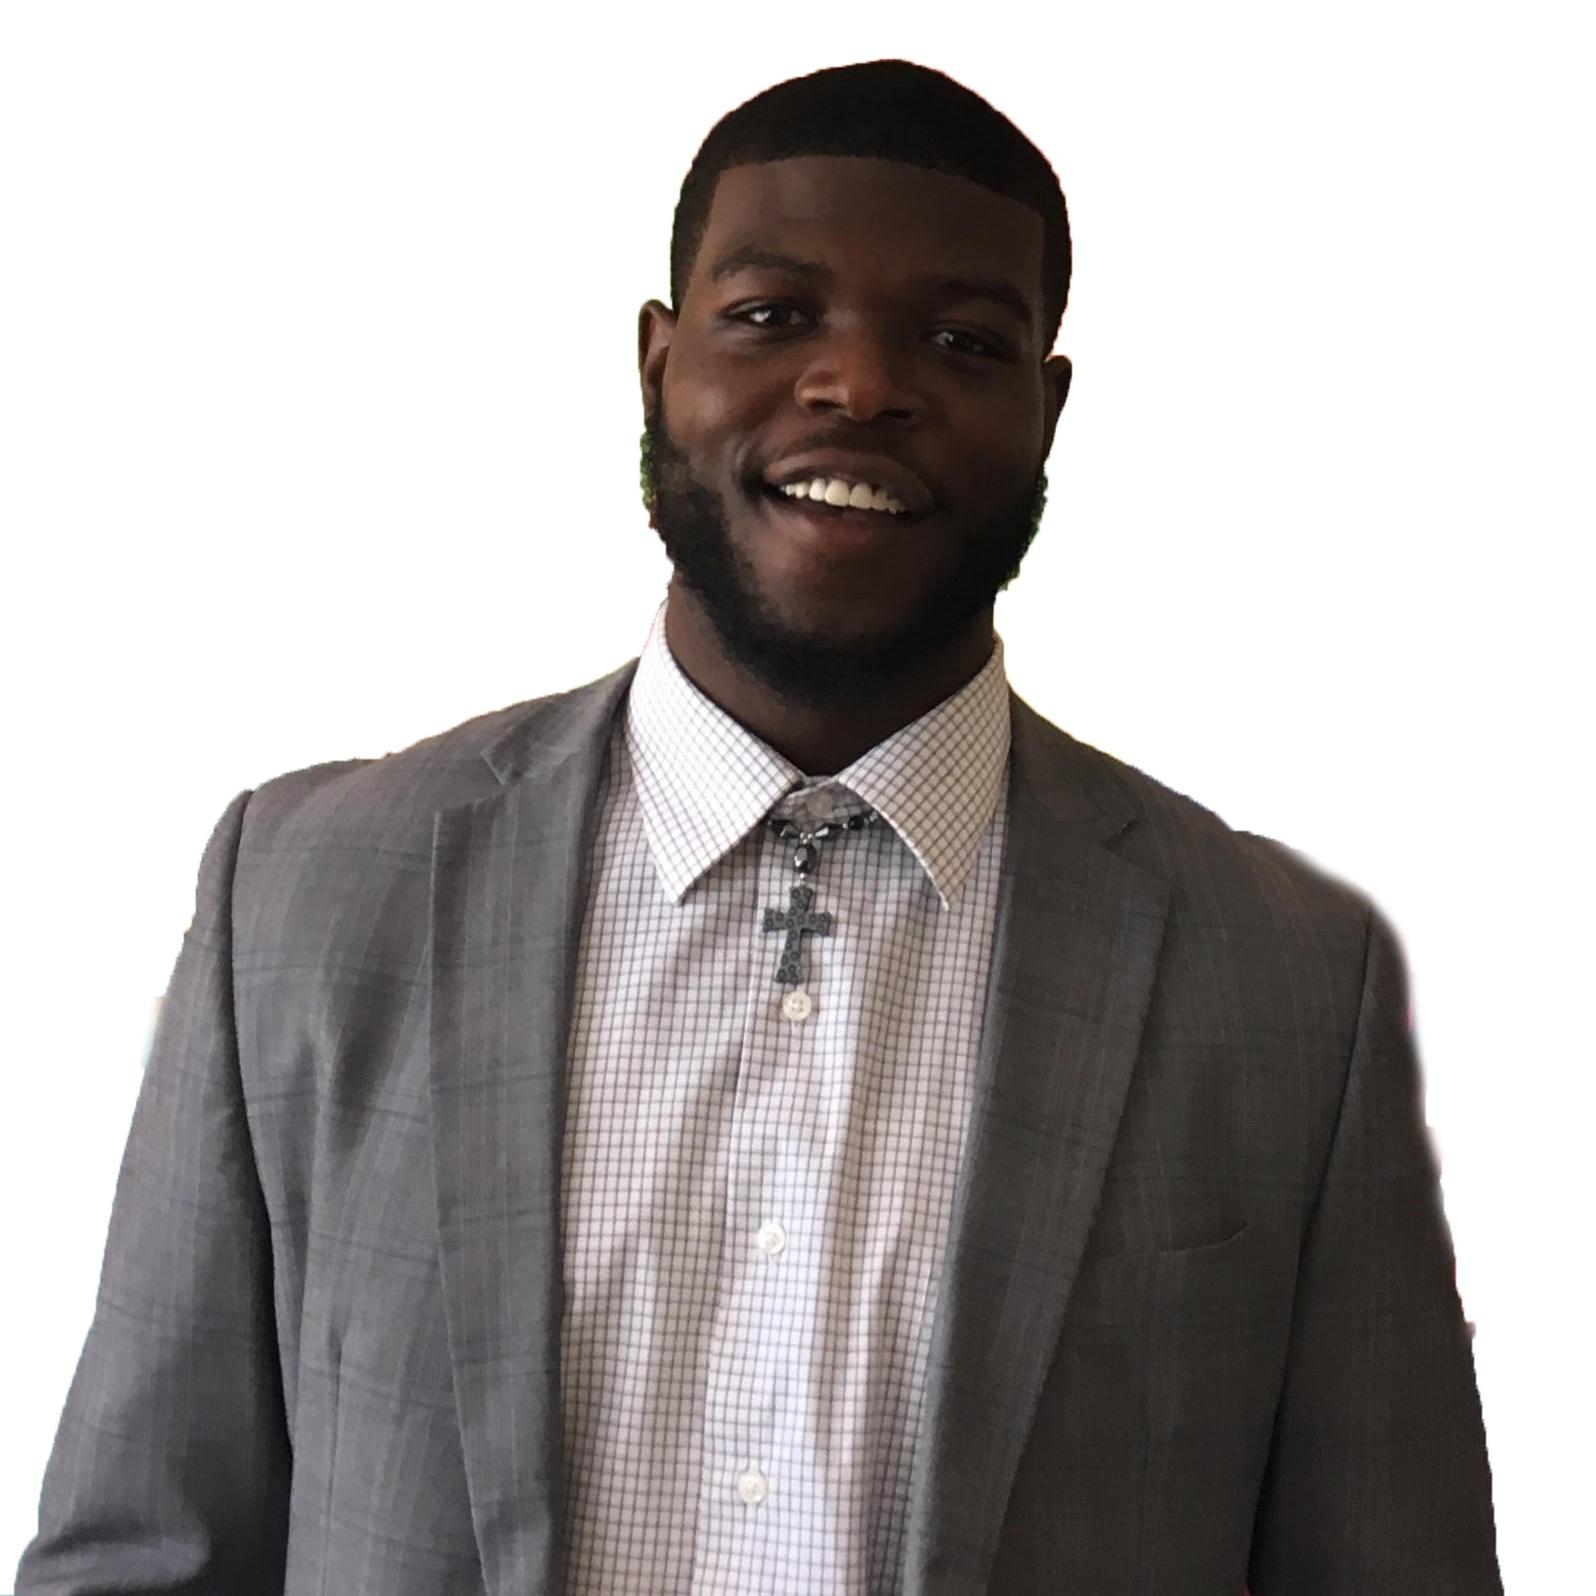 Je'Niah Jackson Asst. Manager | Birmingham